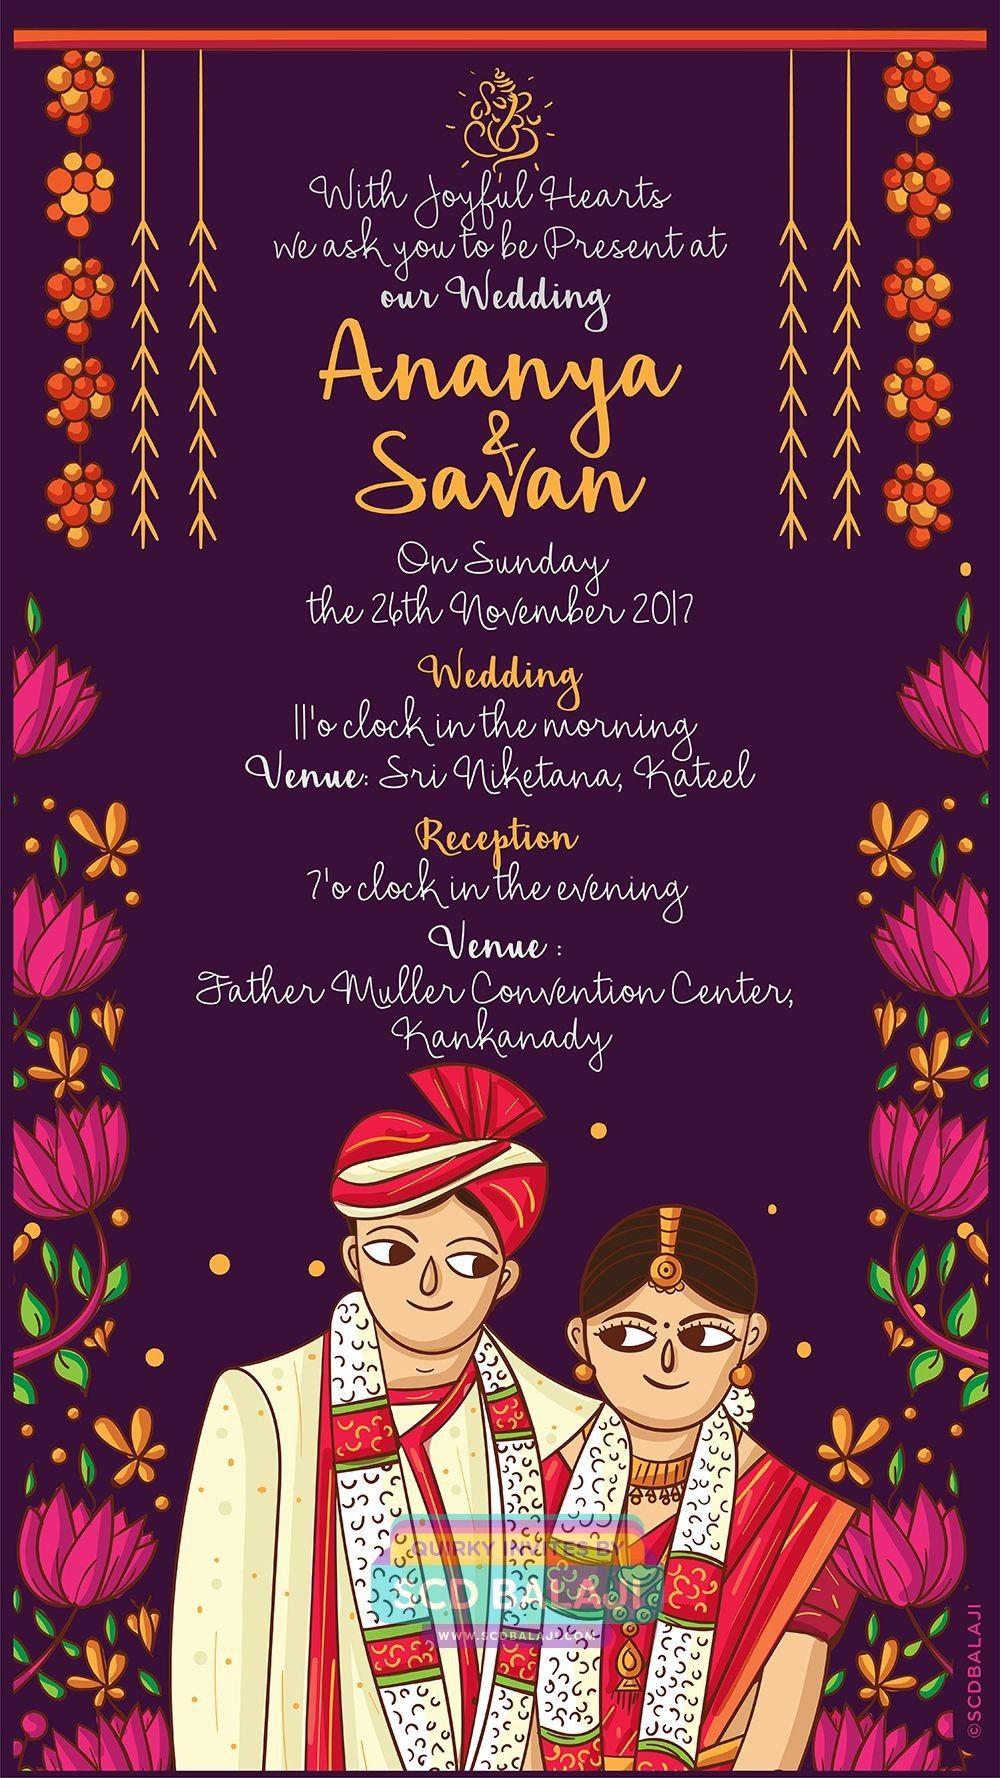 Mohan And Naresh Digital Wedding Invitations Indian Wedding Invitation Cards Creative Wedding Invitations Design